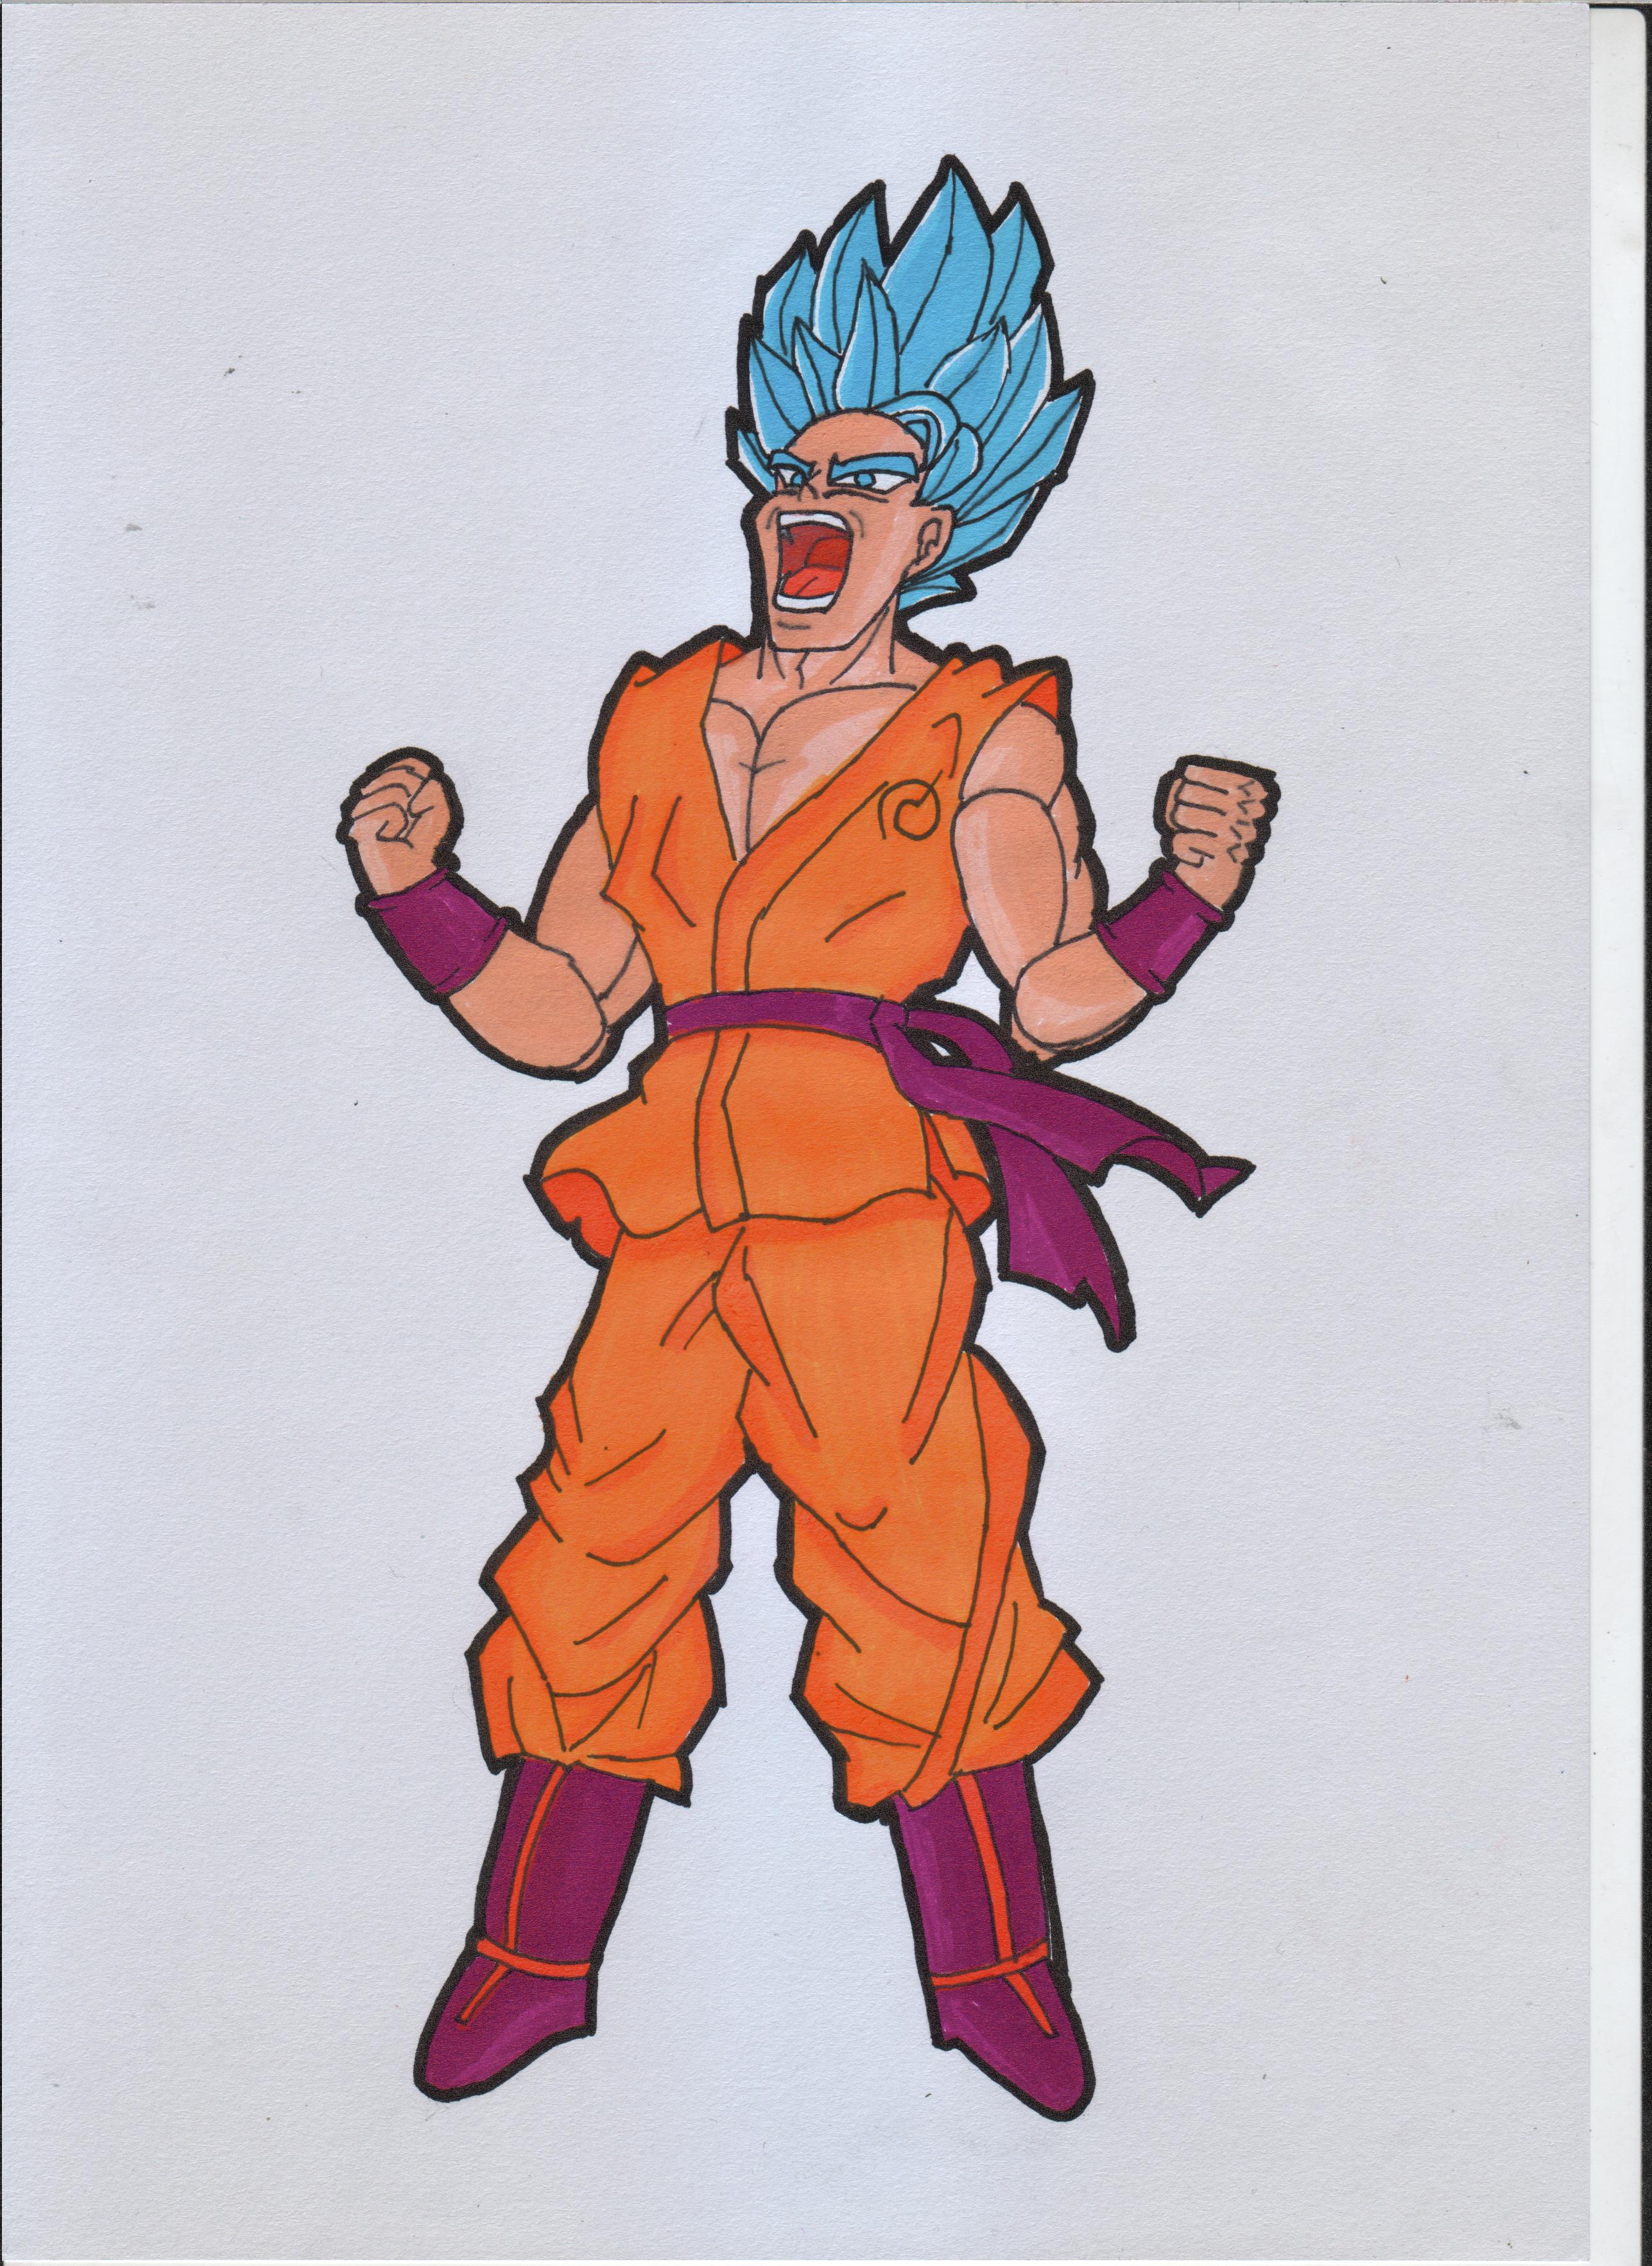 SSJ Blue Goku from Dragon Ball by ForestB